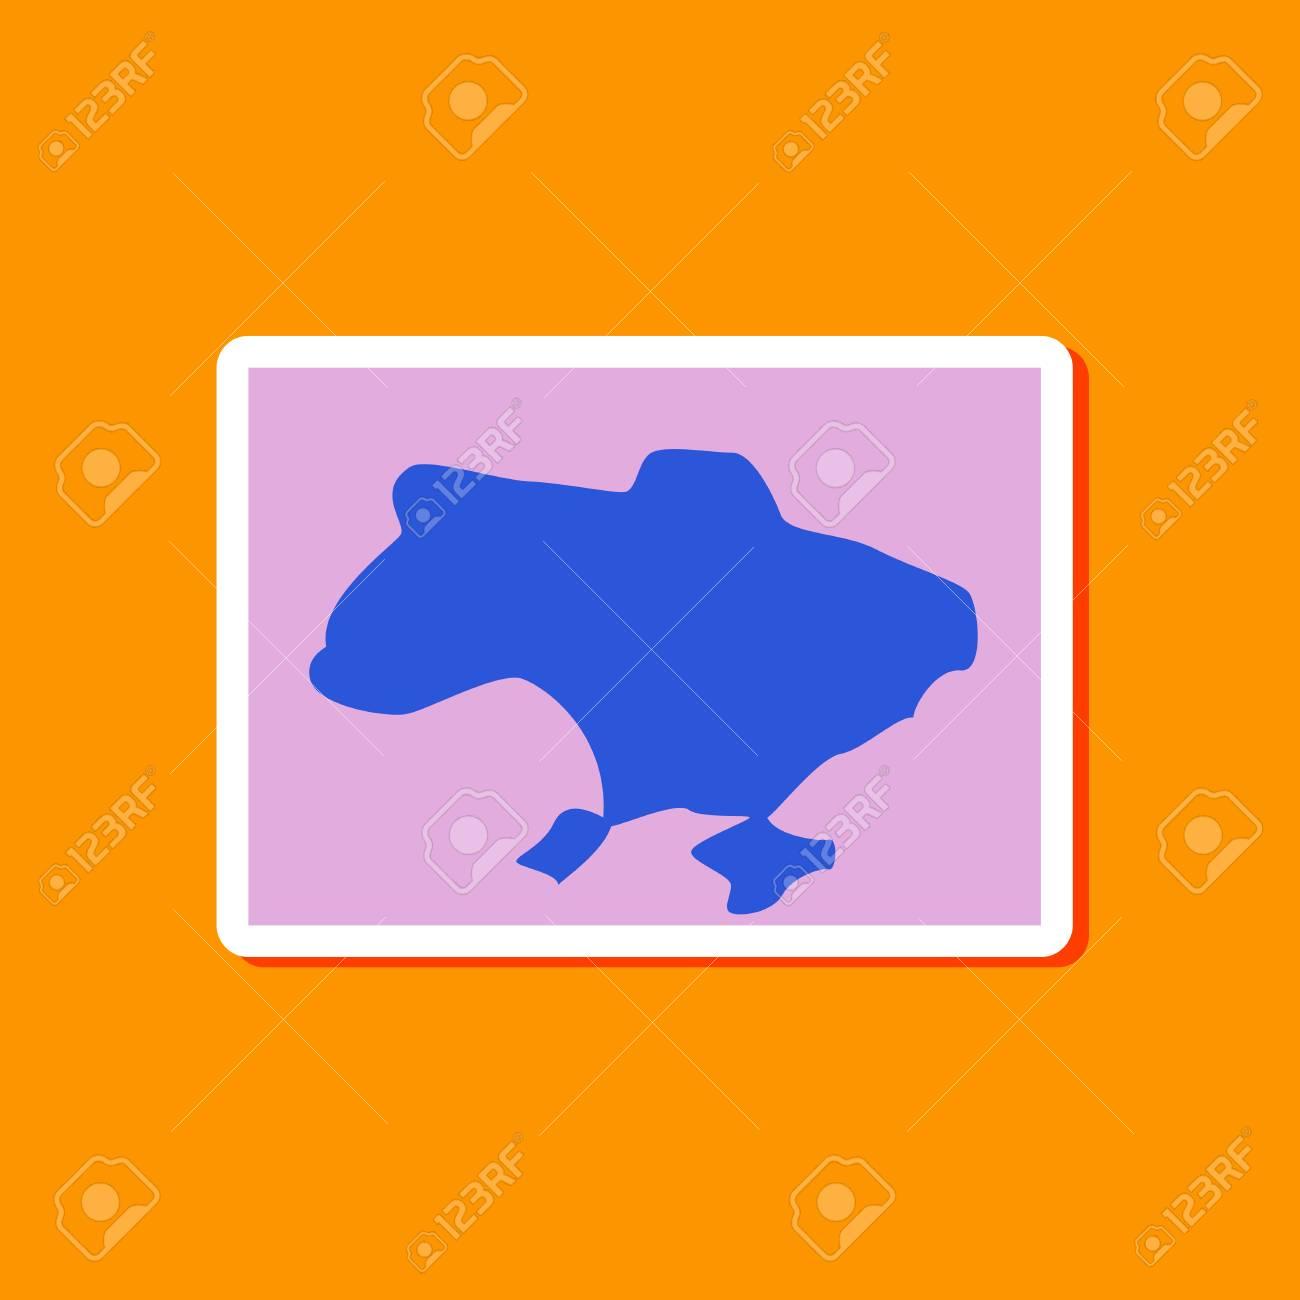 paper sticker on stylish background of map Ukraine - 62579122